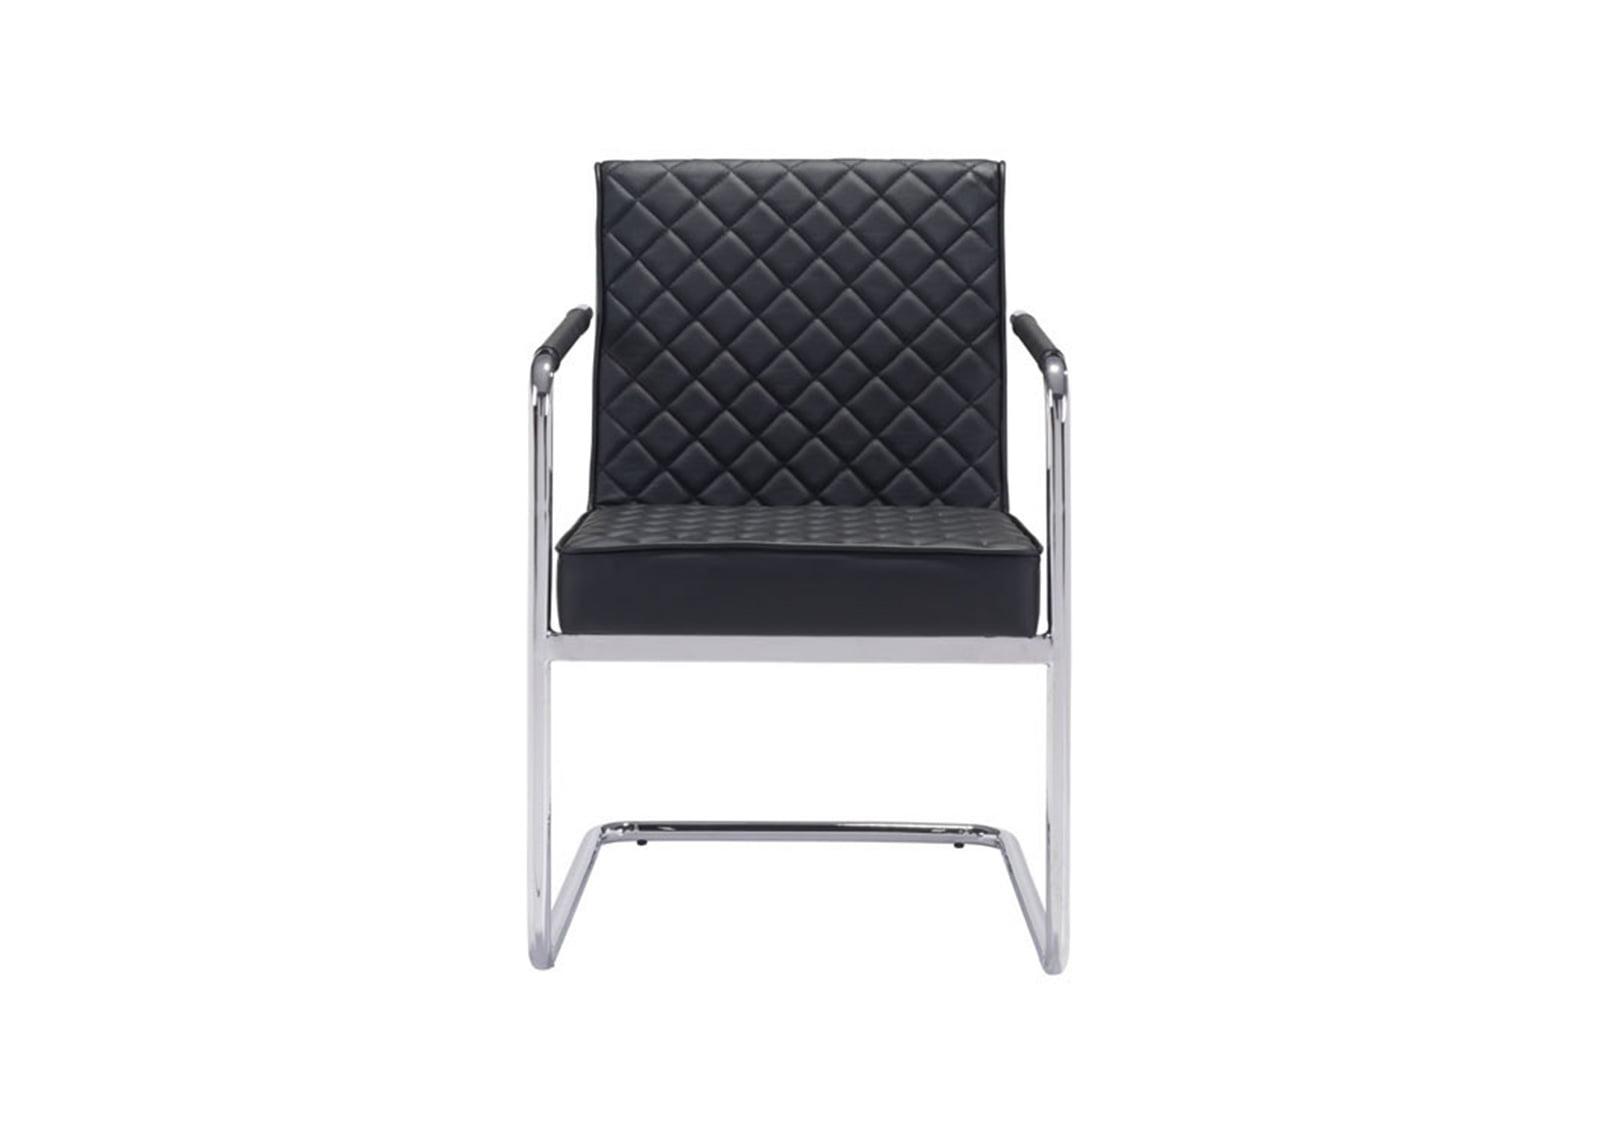 Quilt Dining Chair Black FurnishPlus : Quilt Dining Chair Black3 from furnishplus.ca size 1600 x 1134 jpeg 85kB